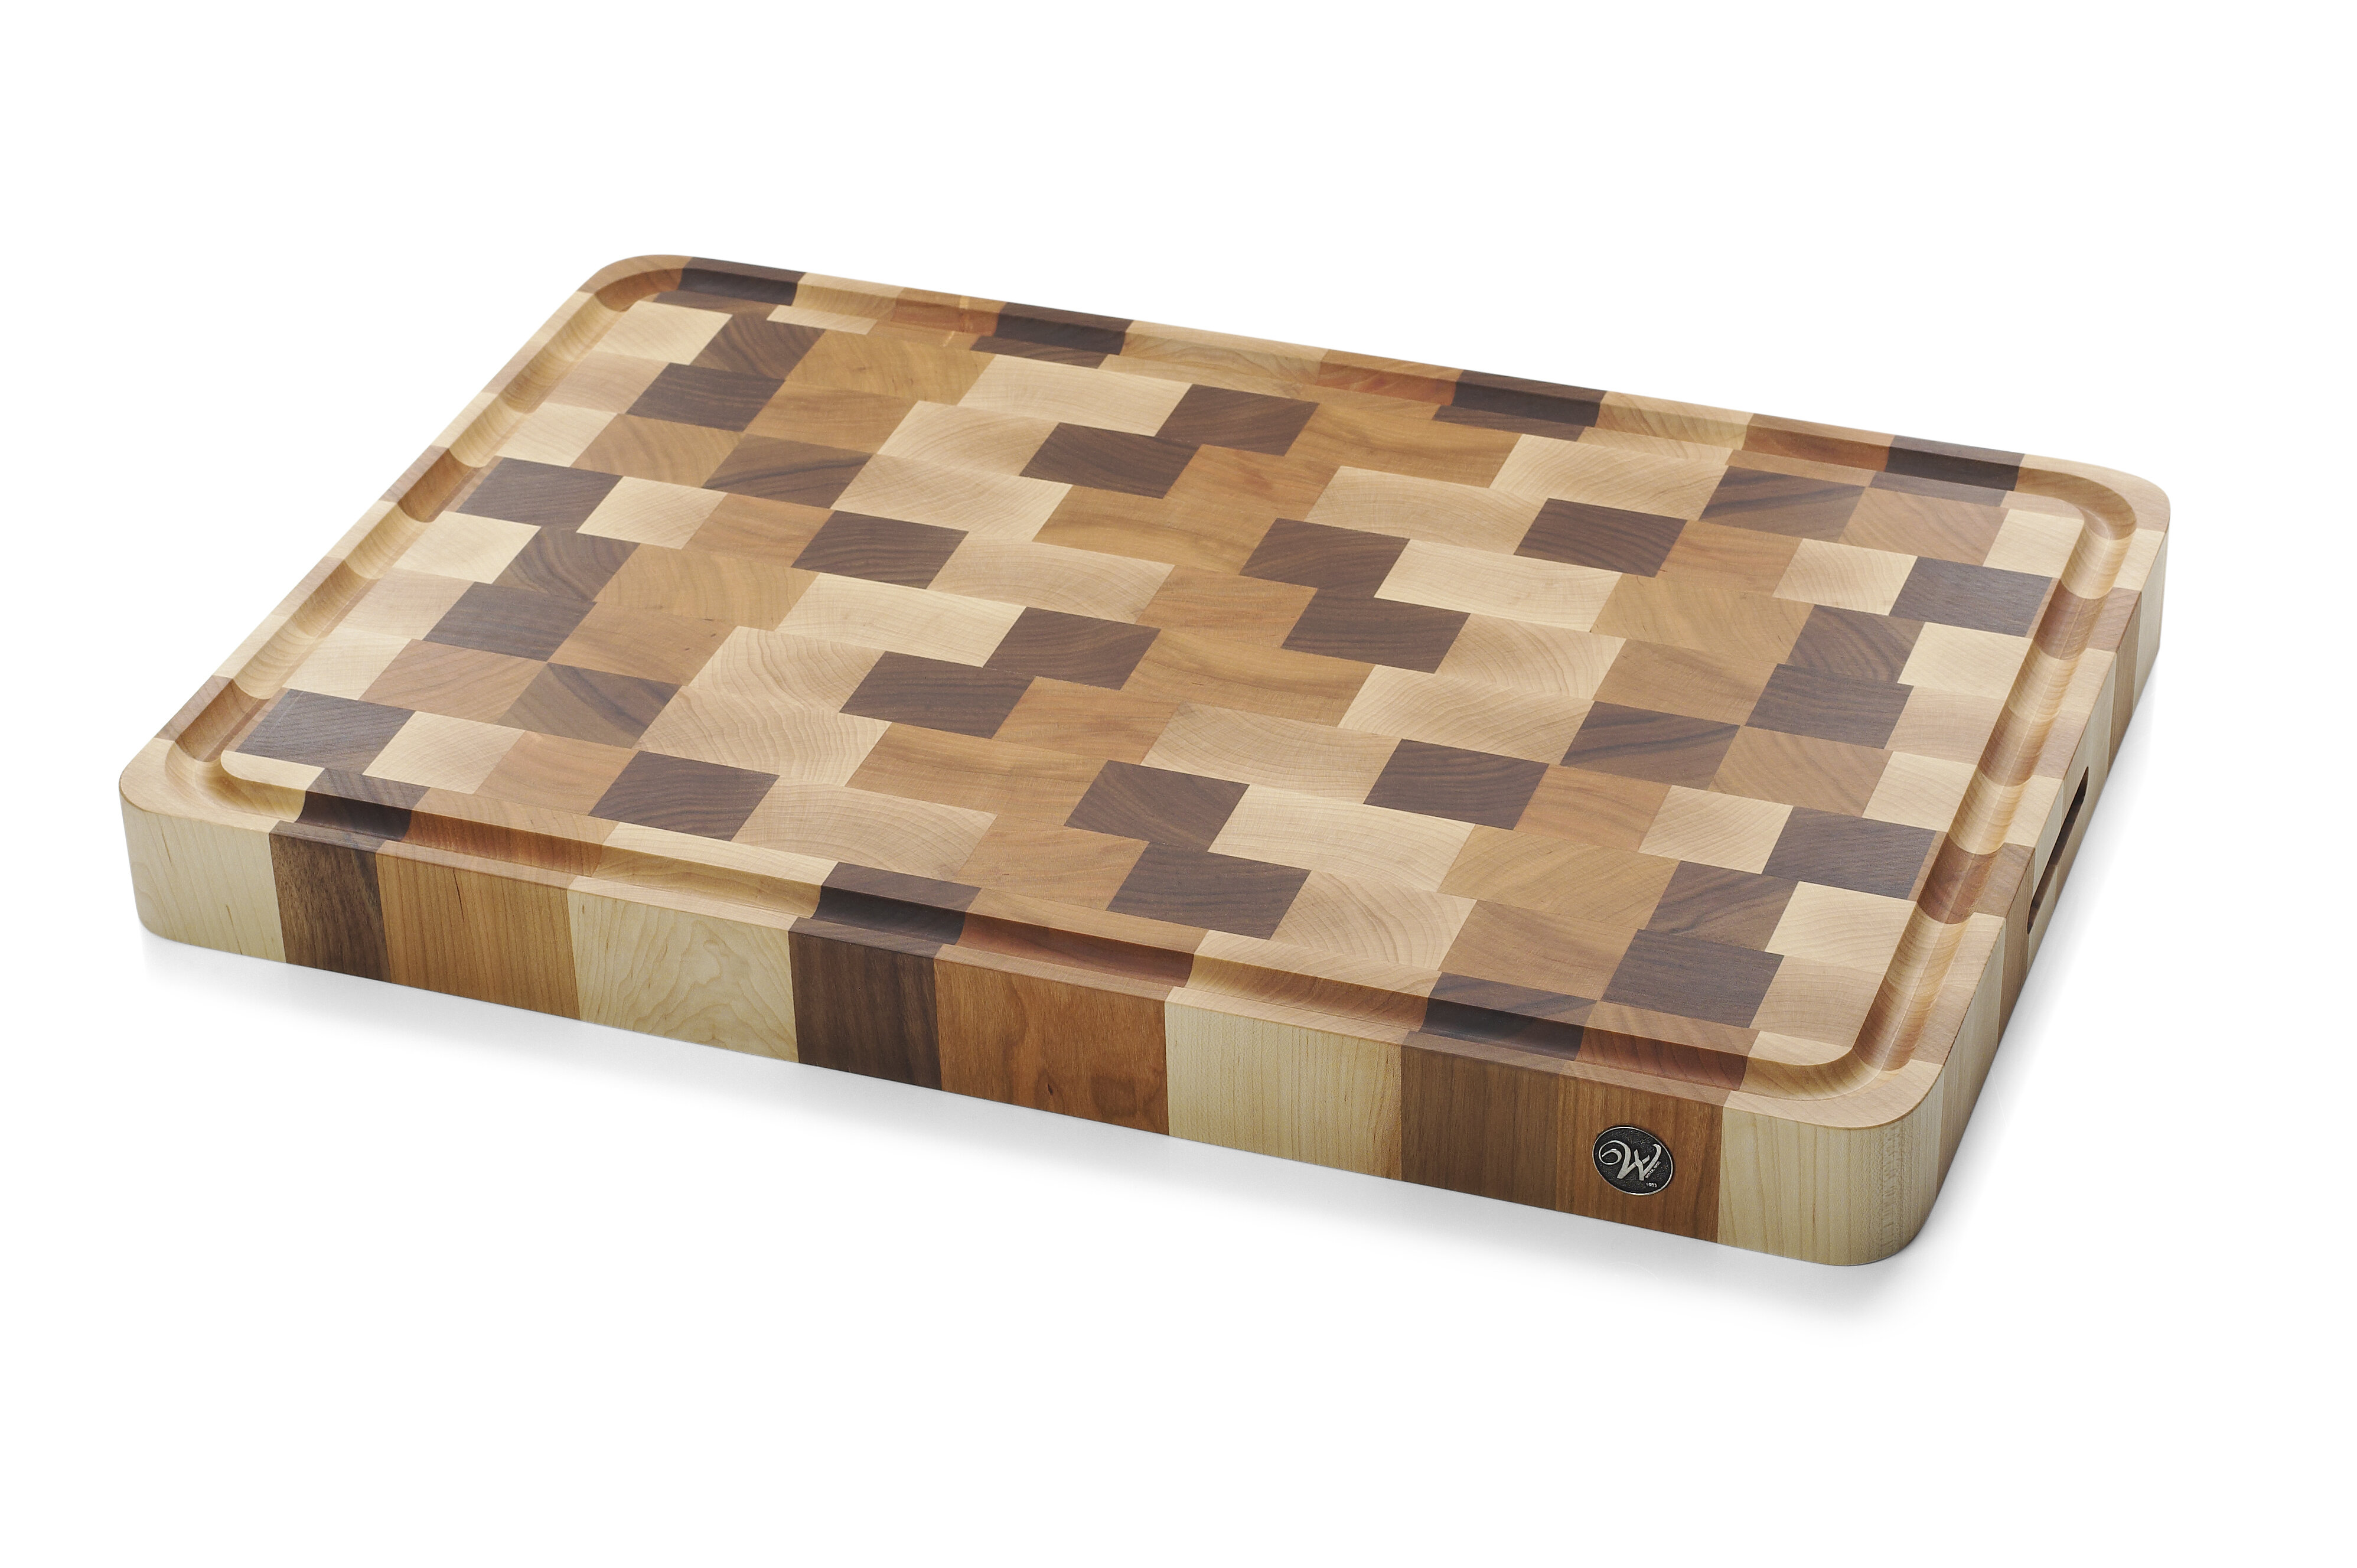 Warther Boards Wood Cutting Board Wayfair